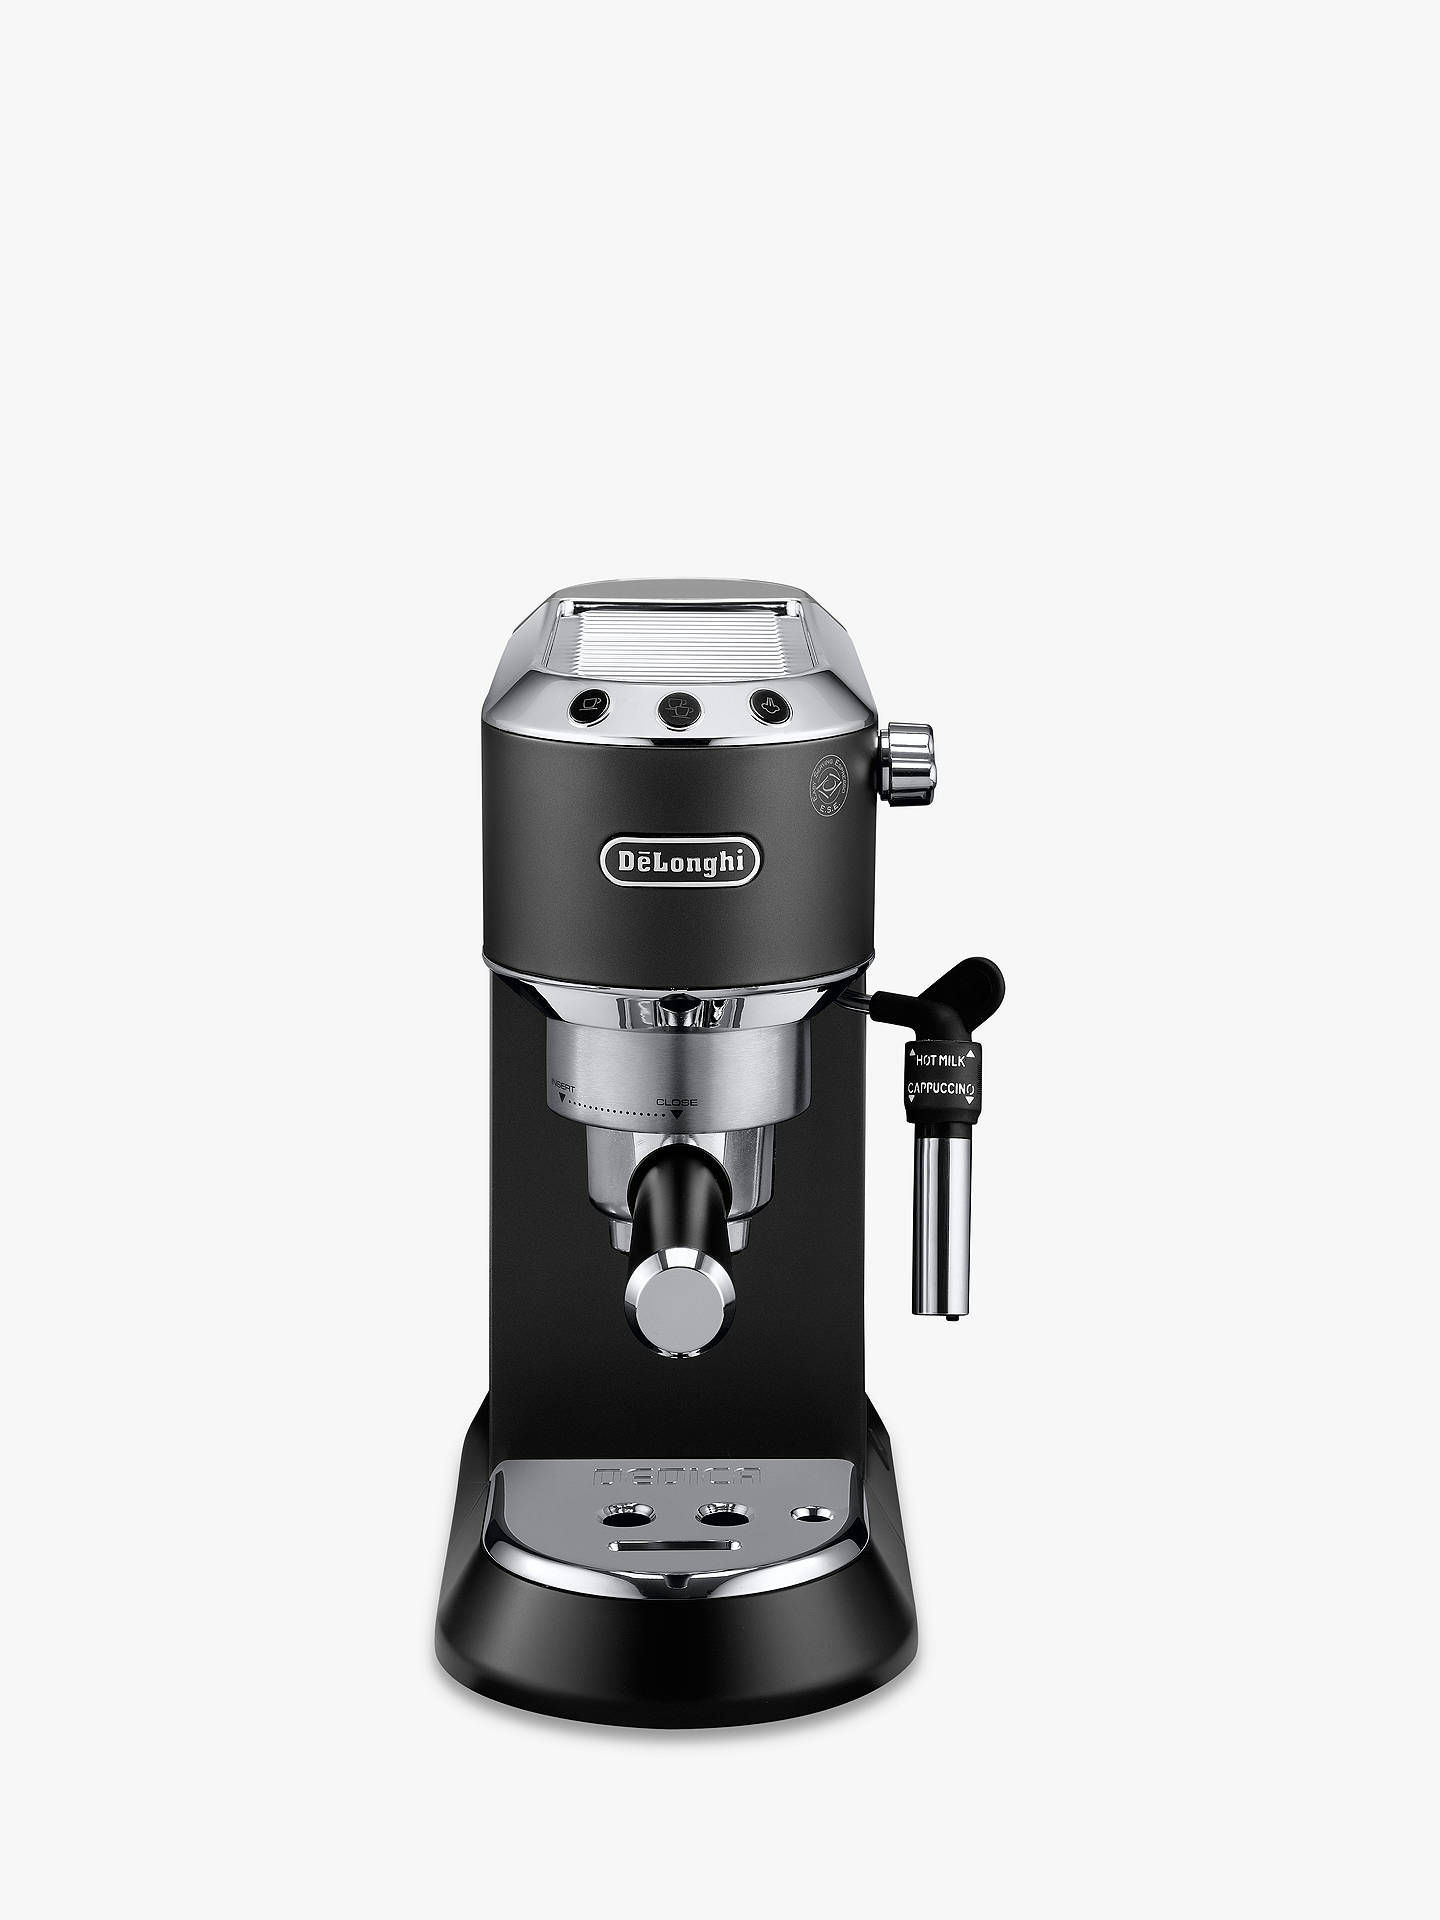 abe6eac131b8 De Longhi EC685 Dedica Style Pump Espresso Coffee Machine at John ...